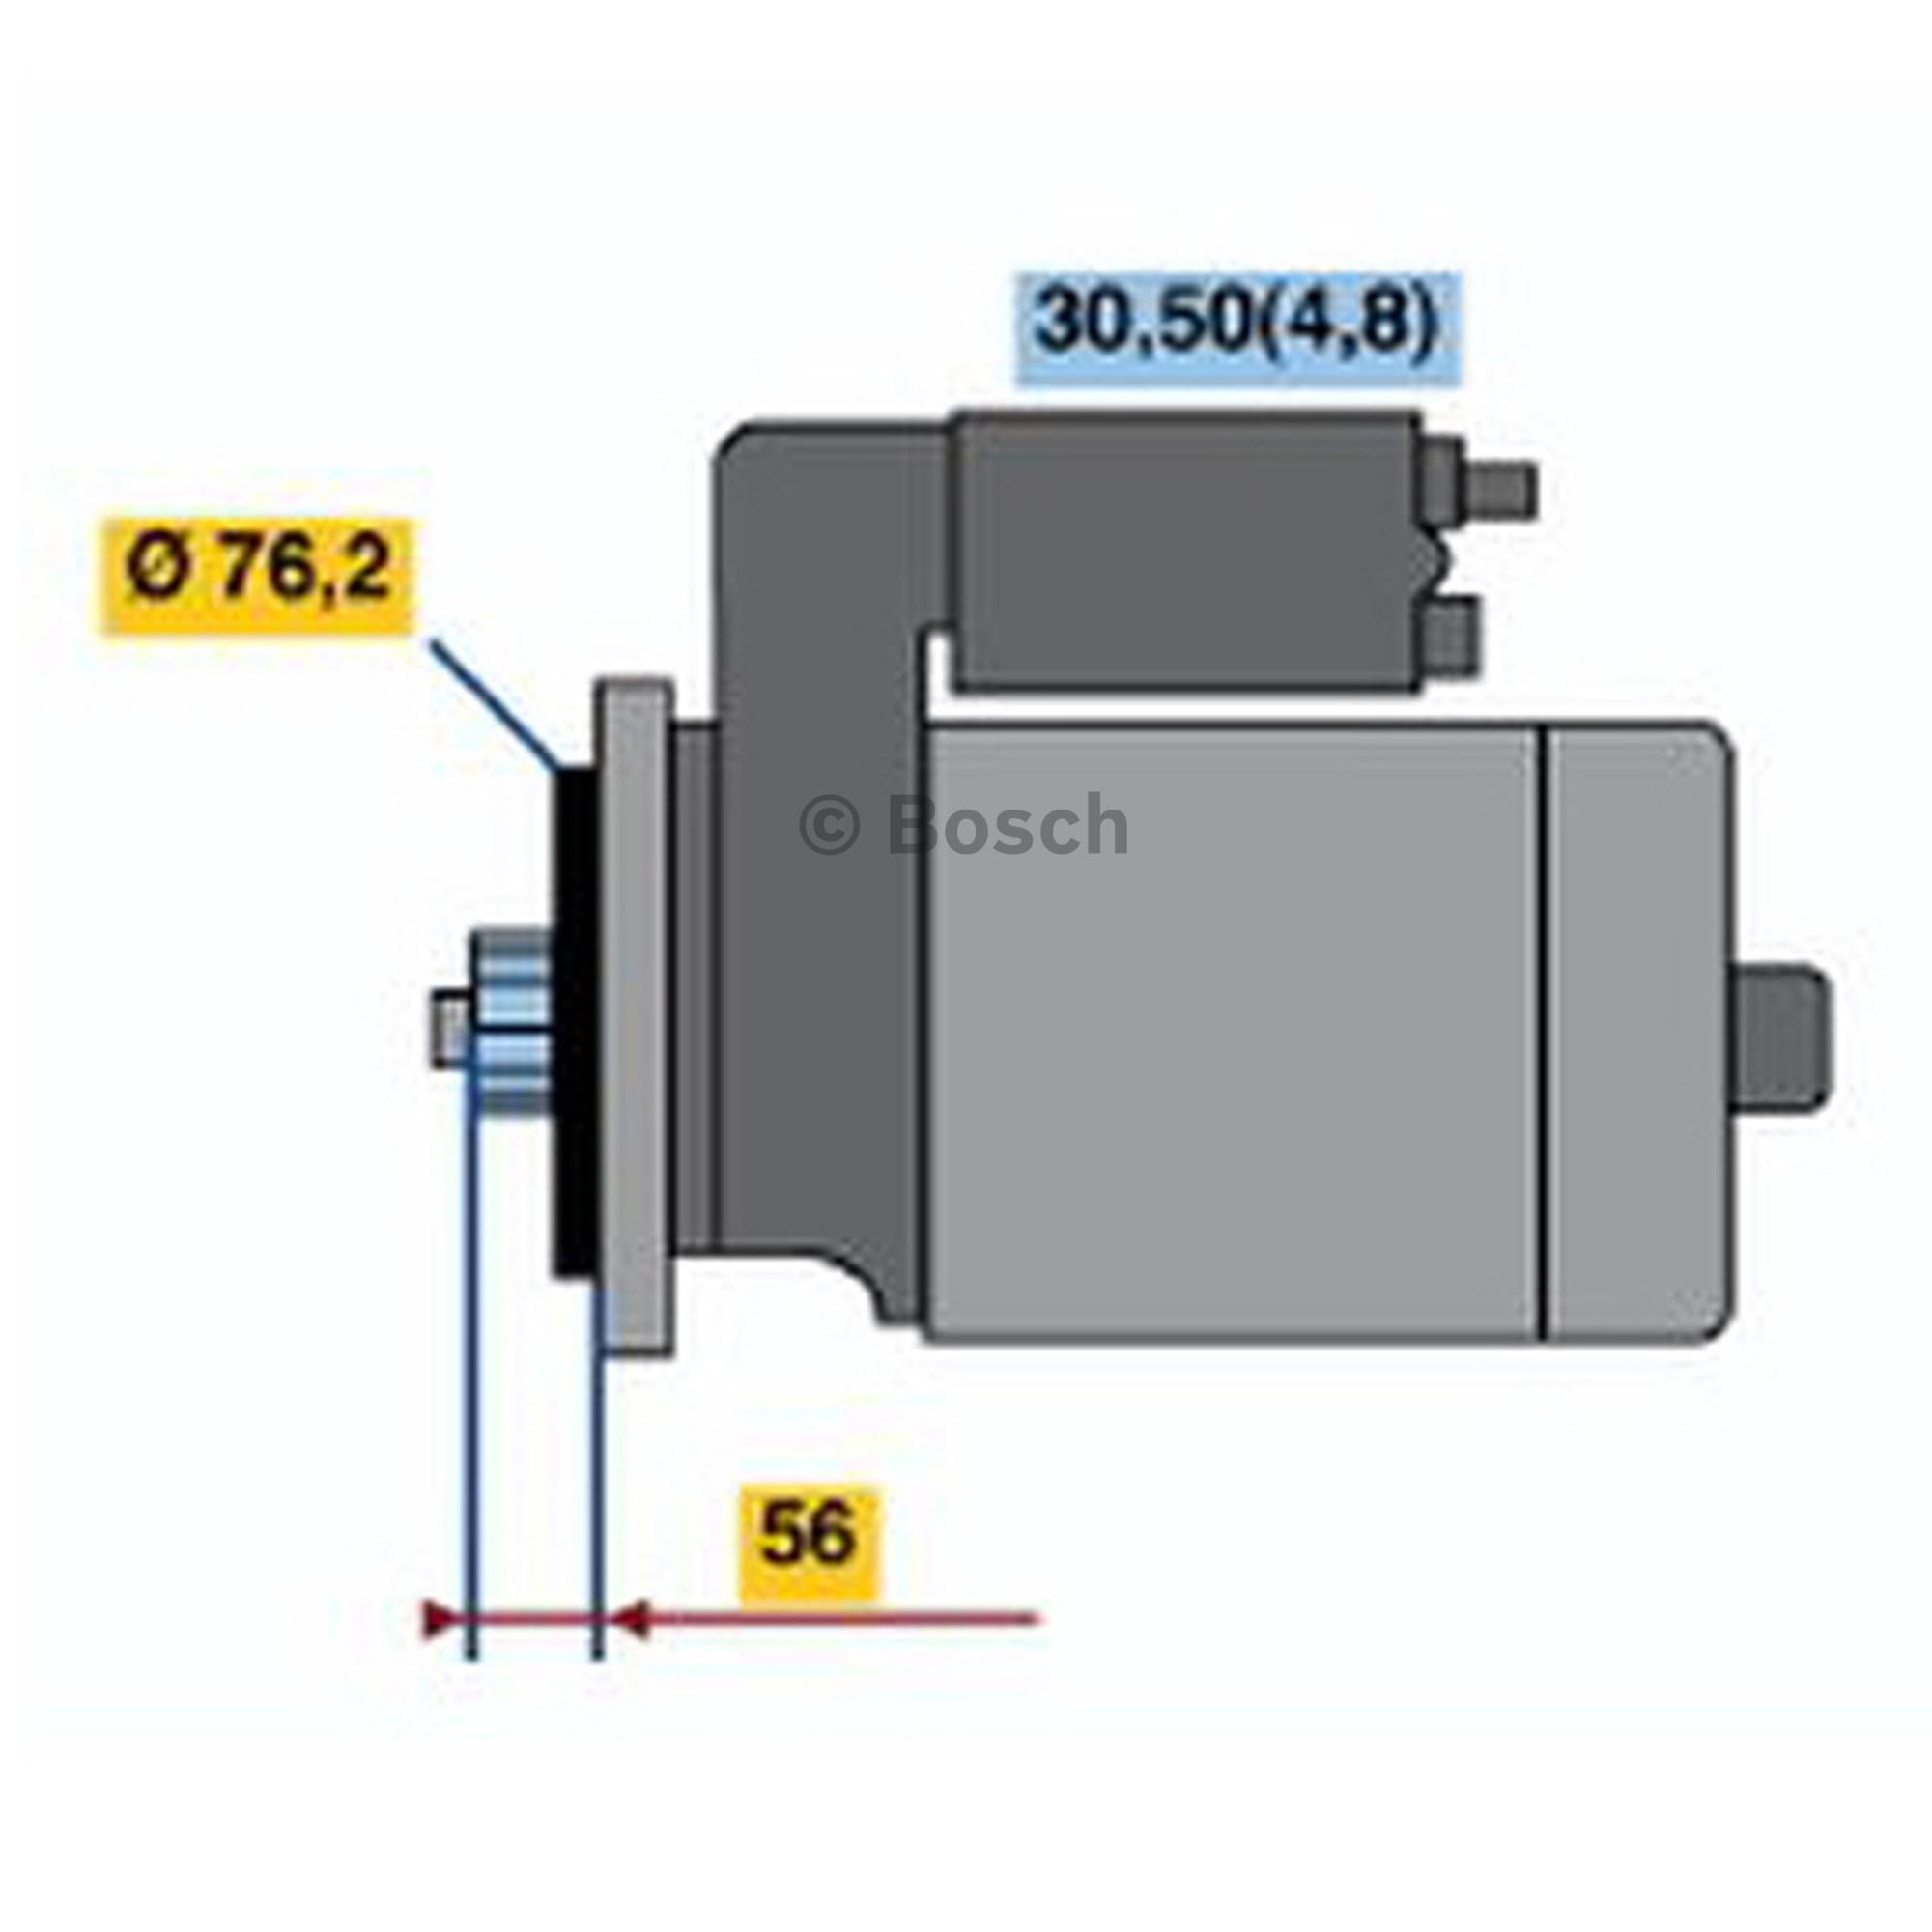 hight resolution of details about bosch starter motor 0 001 120 406 fits skoda fabia 1 2 5j 63kw 1 2 77 tsi